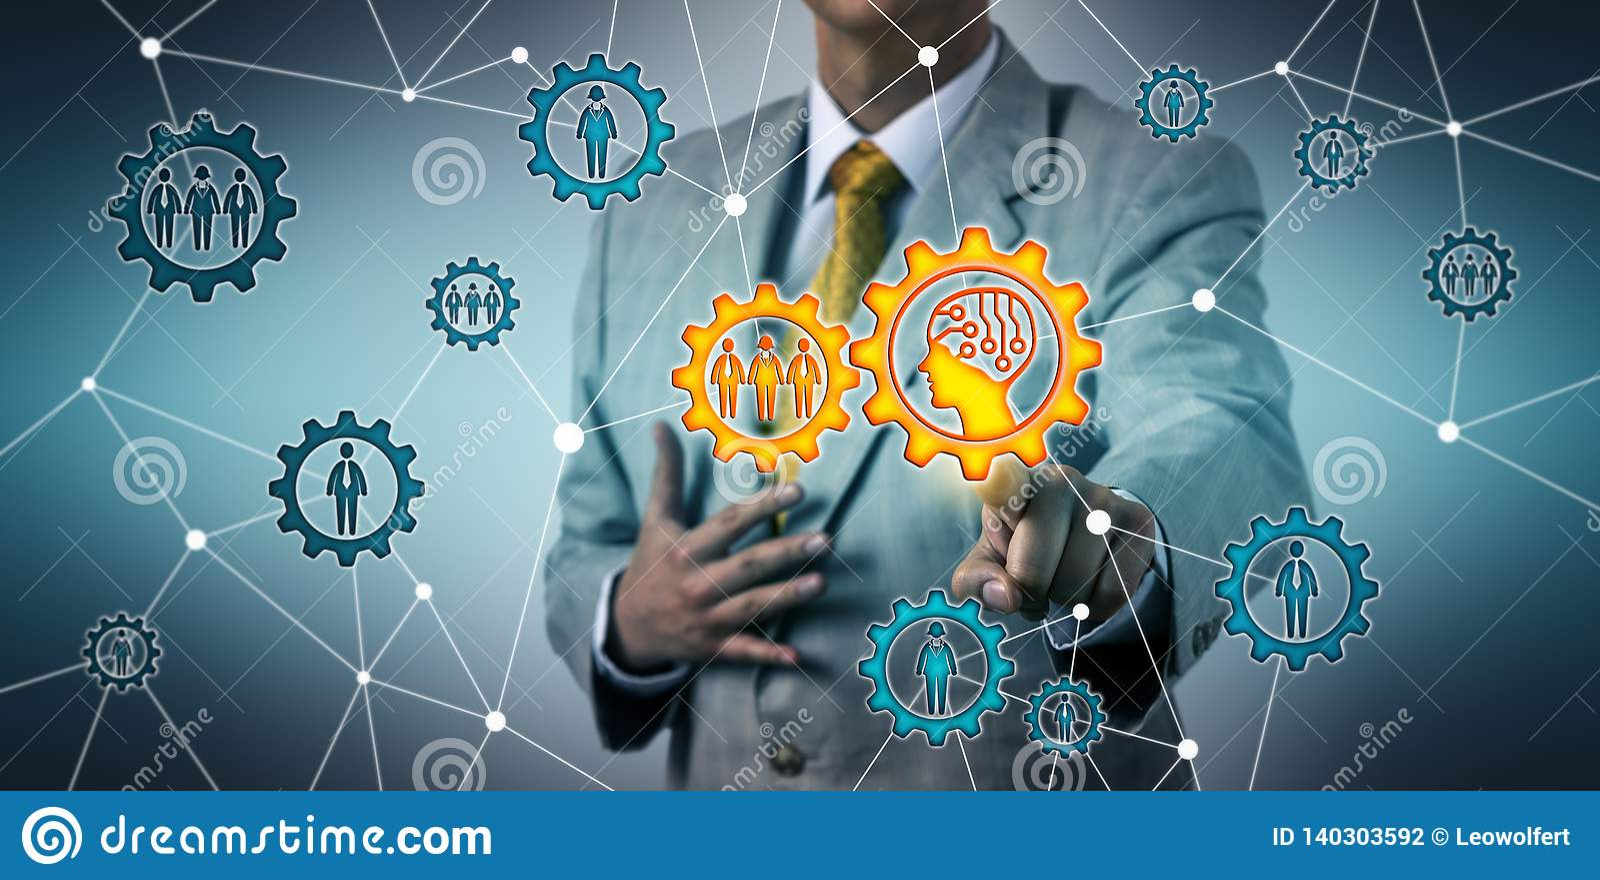 Gerente Connecting With Work Team Via AI na roda denteada